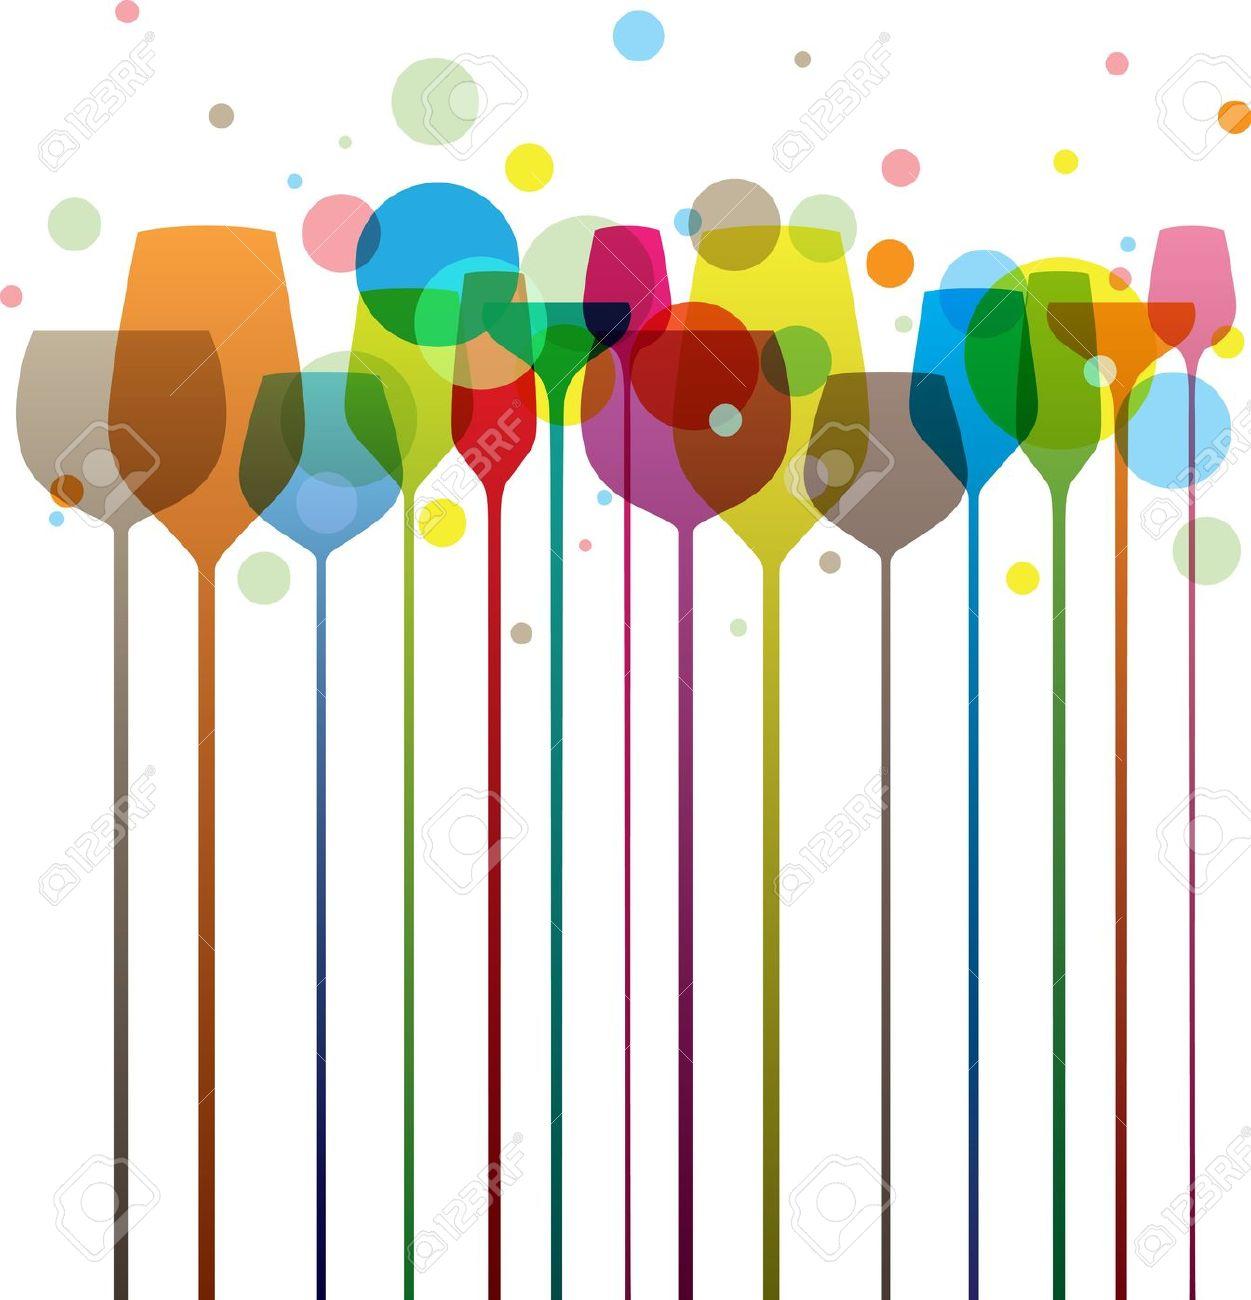 Alkohol trinken clipart jpg royalty free library Bunte Alkohol Trinken Gläser, Perfekt Für Ihre Partei Und F- & -B ... jpg royalty free library